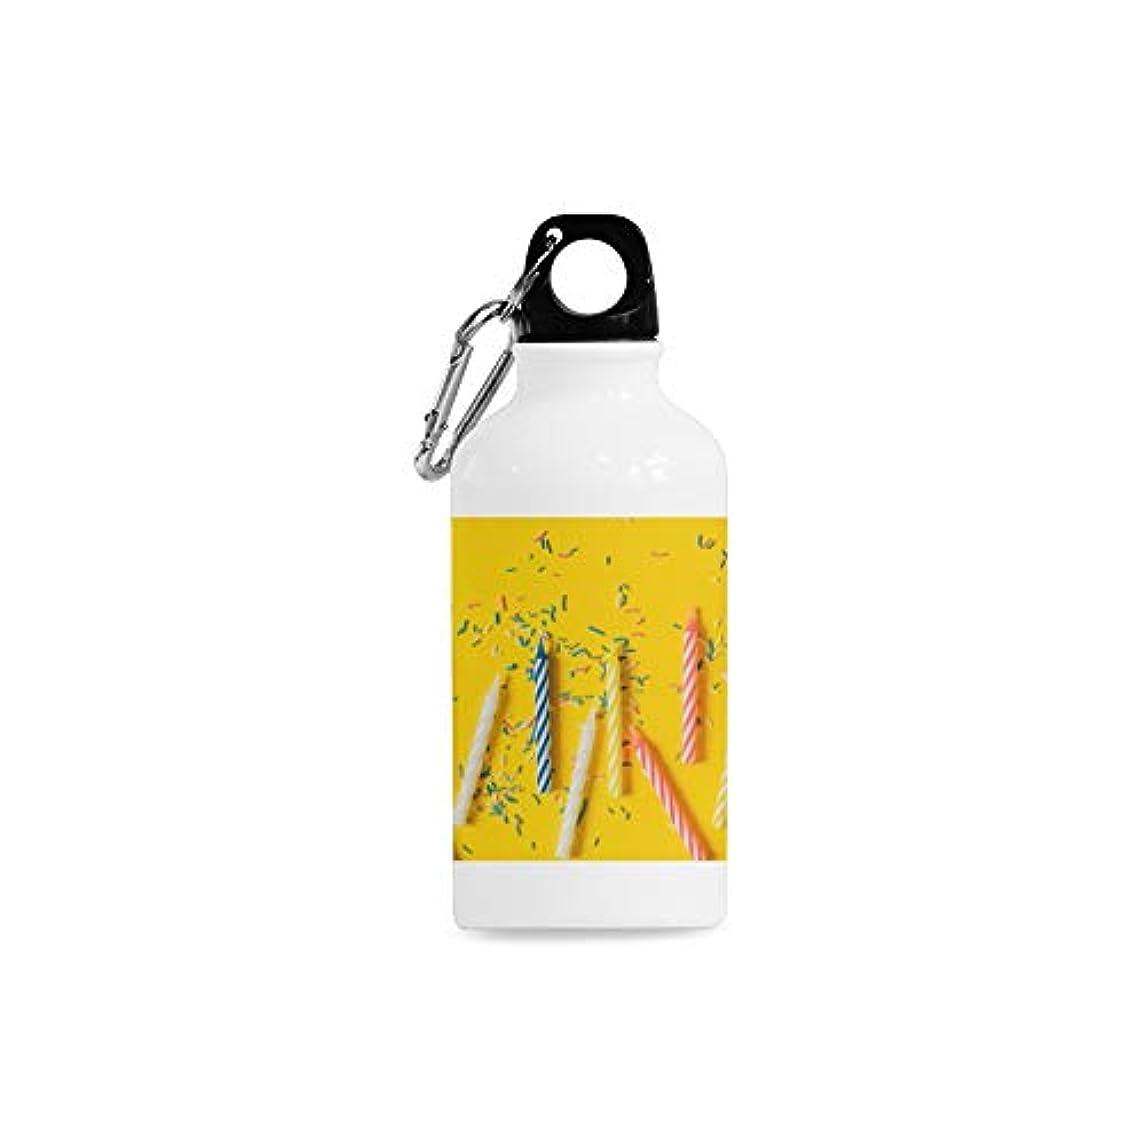 ENEVOTX Outdoor Simple Fashion Travel Burning Candle Orange Brown Romantic Atmosphere Design Creative Style Print Design Sport Water Bottle Aluminum Stainless Steel Bottle Aluminum Sport Water Bottle